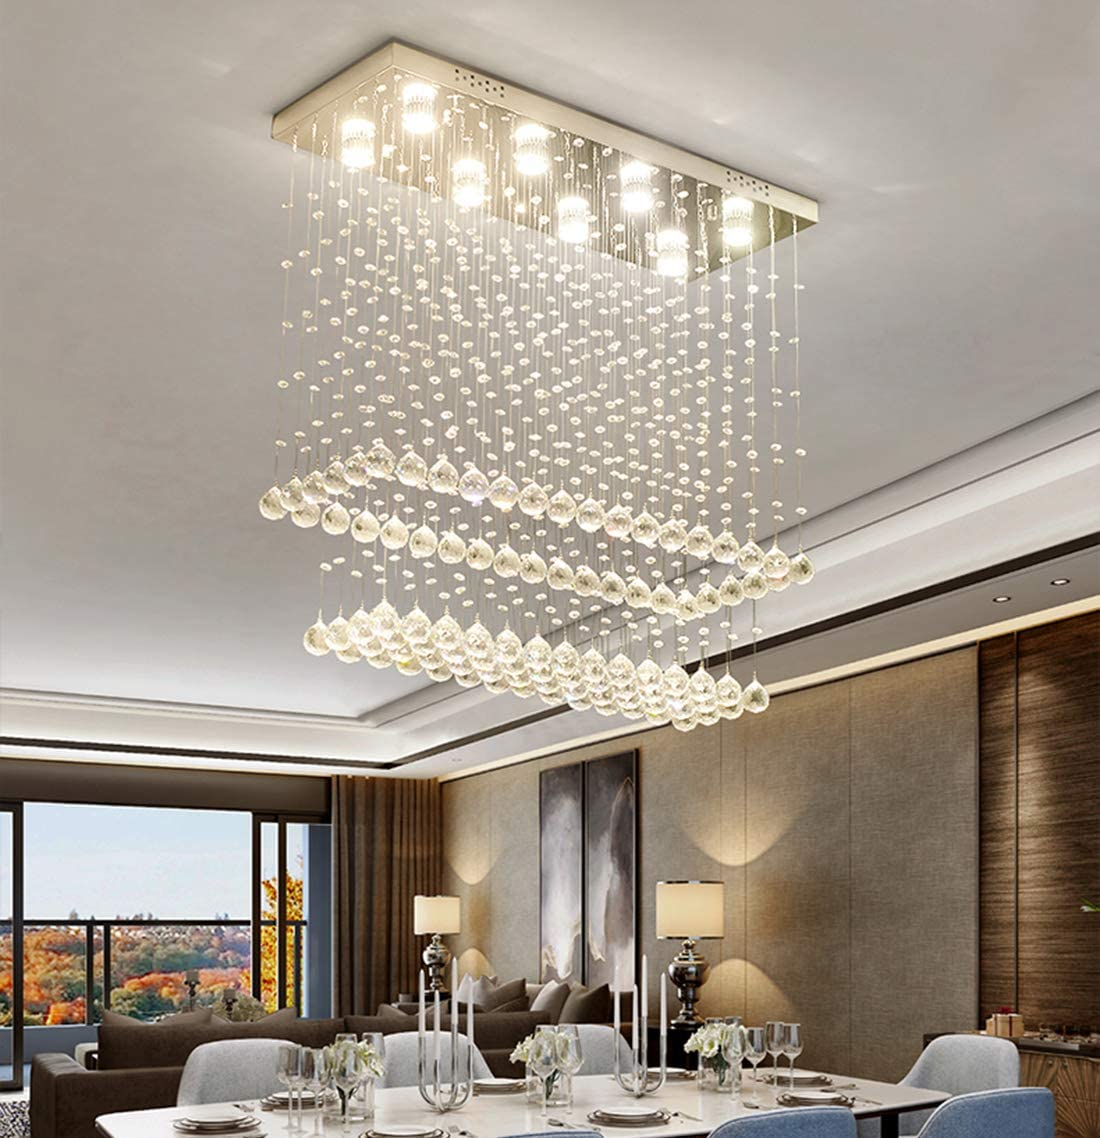 Moooni Modern Rectangular Crystal Chandelier Ceiling Lighting Fixture Raindrop Pendant Flush Mount Light Rectangle Chandeliers for Dining Rooms Kitchen L 47 x W 12 x H 31.5